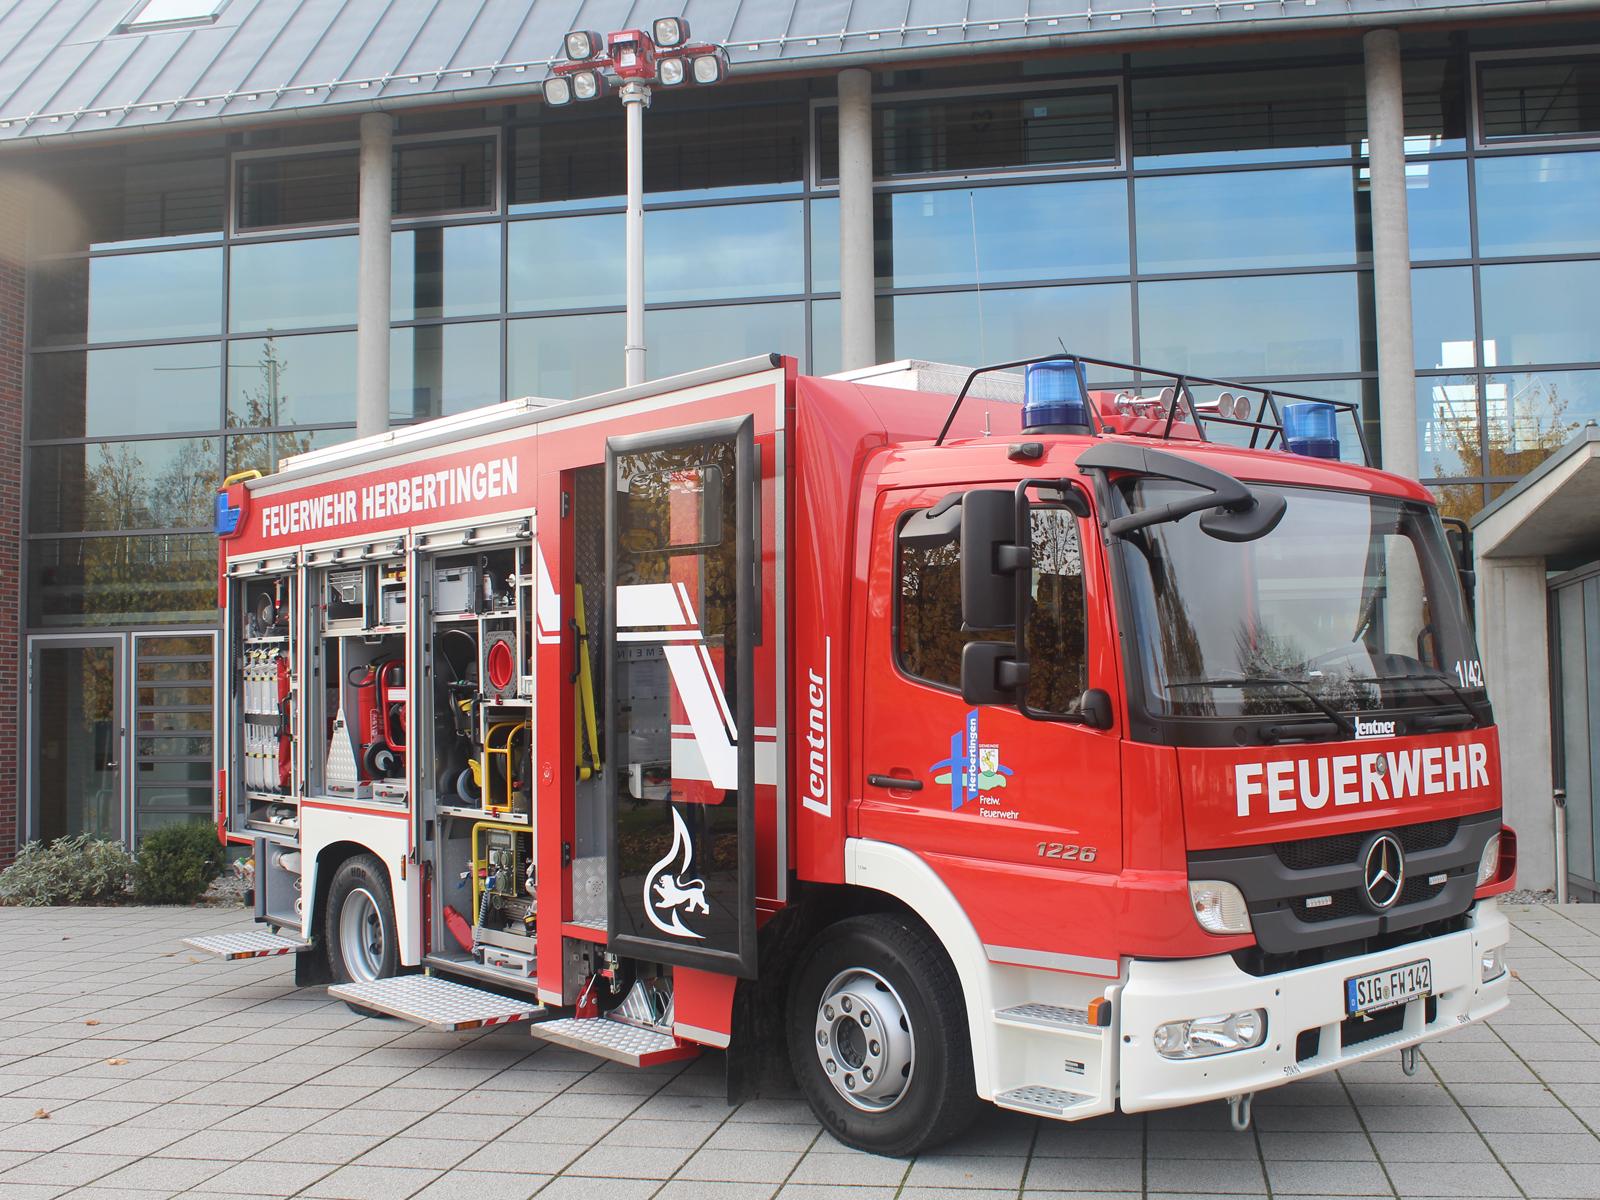 Feuerwehrauto vor dem Rathaus Herbertingen